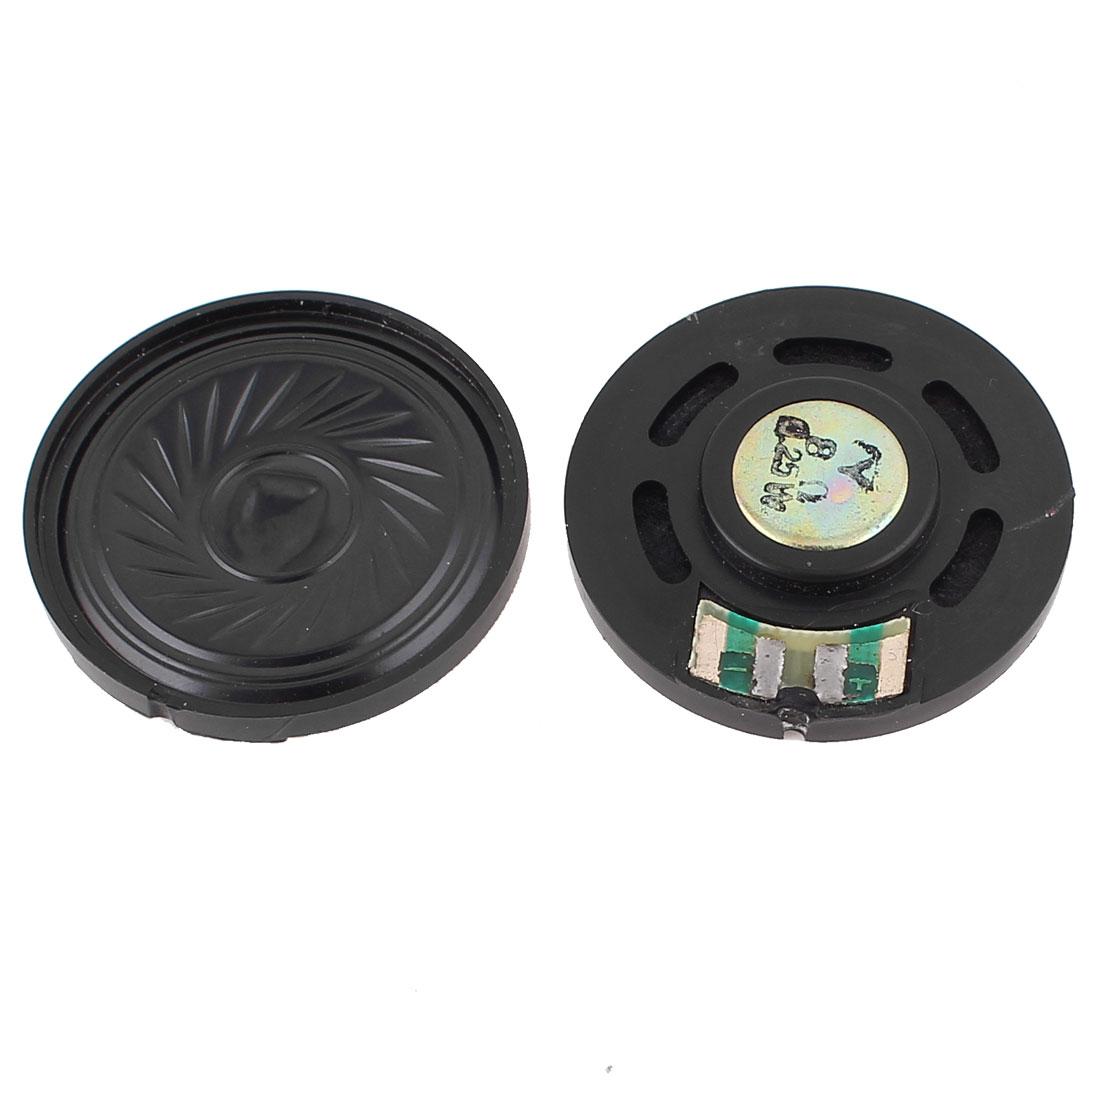 2 Pcs 0.25W 8 Ohm 36mm Round Inside Magnet Electronic Speaker Loudspeaker